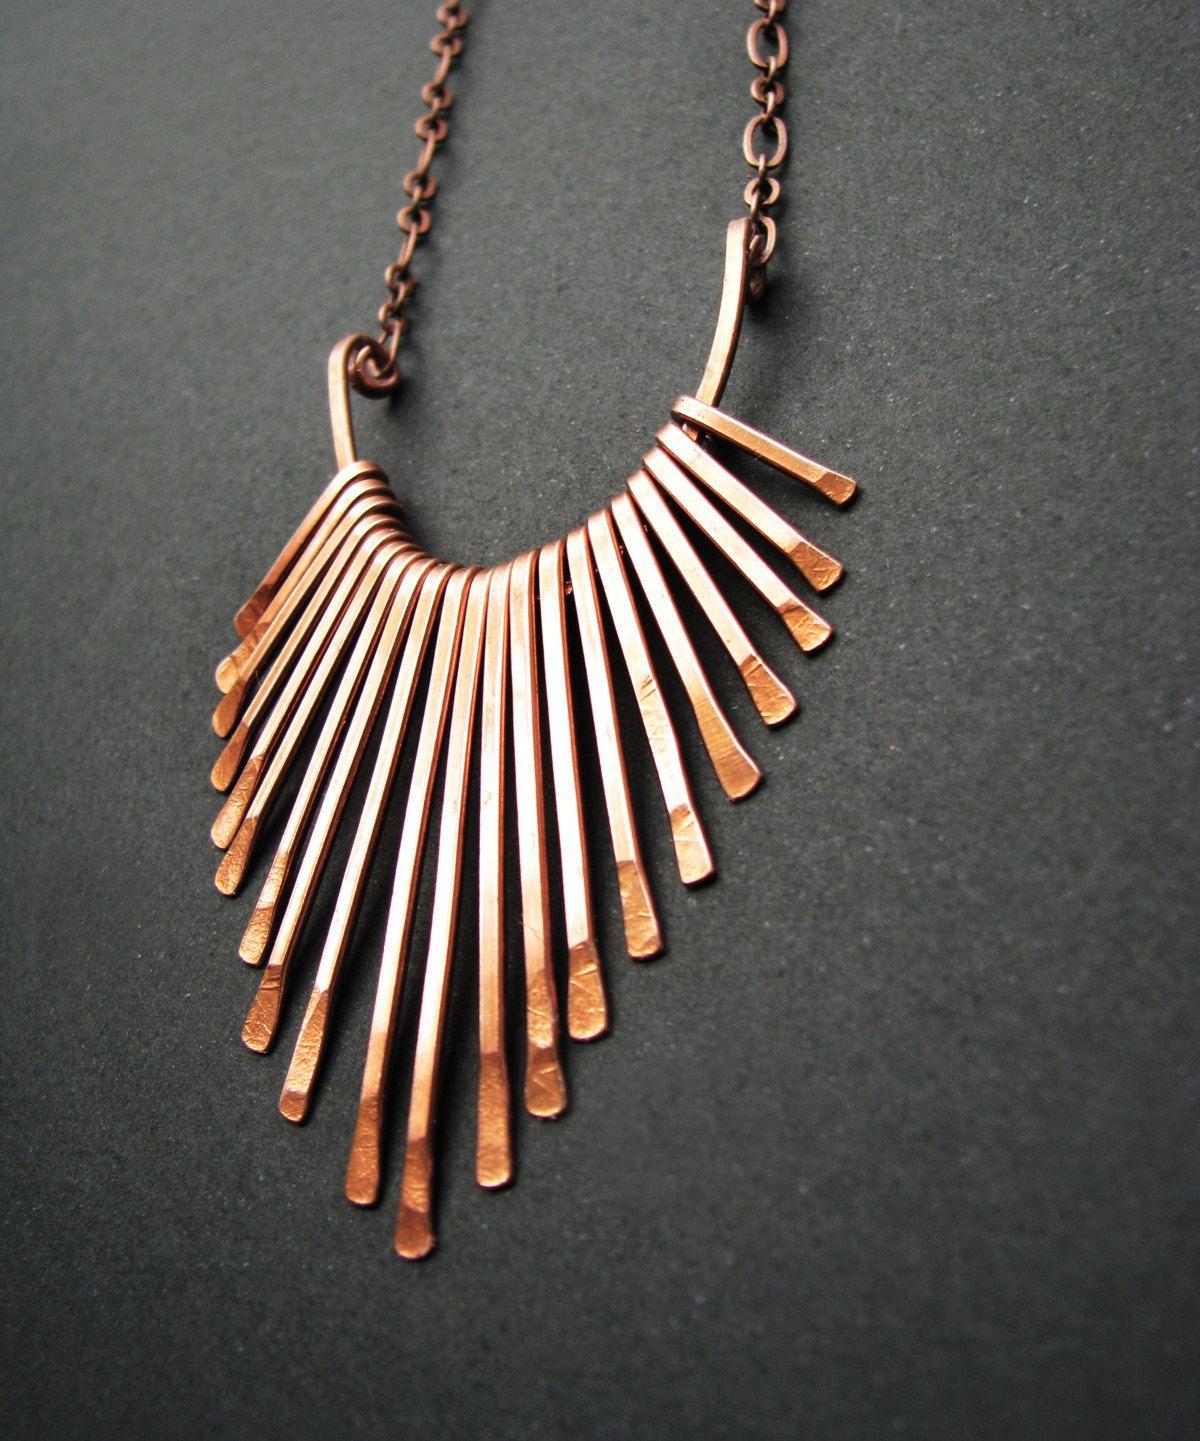 Copper Necklace - Fringe Freya Design - handmade copper jewelry in ...